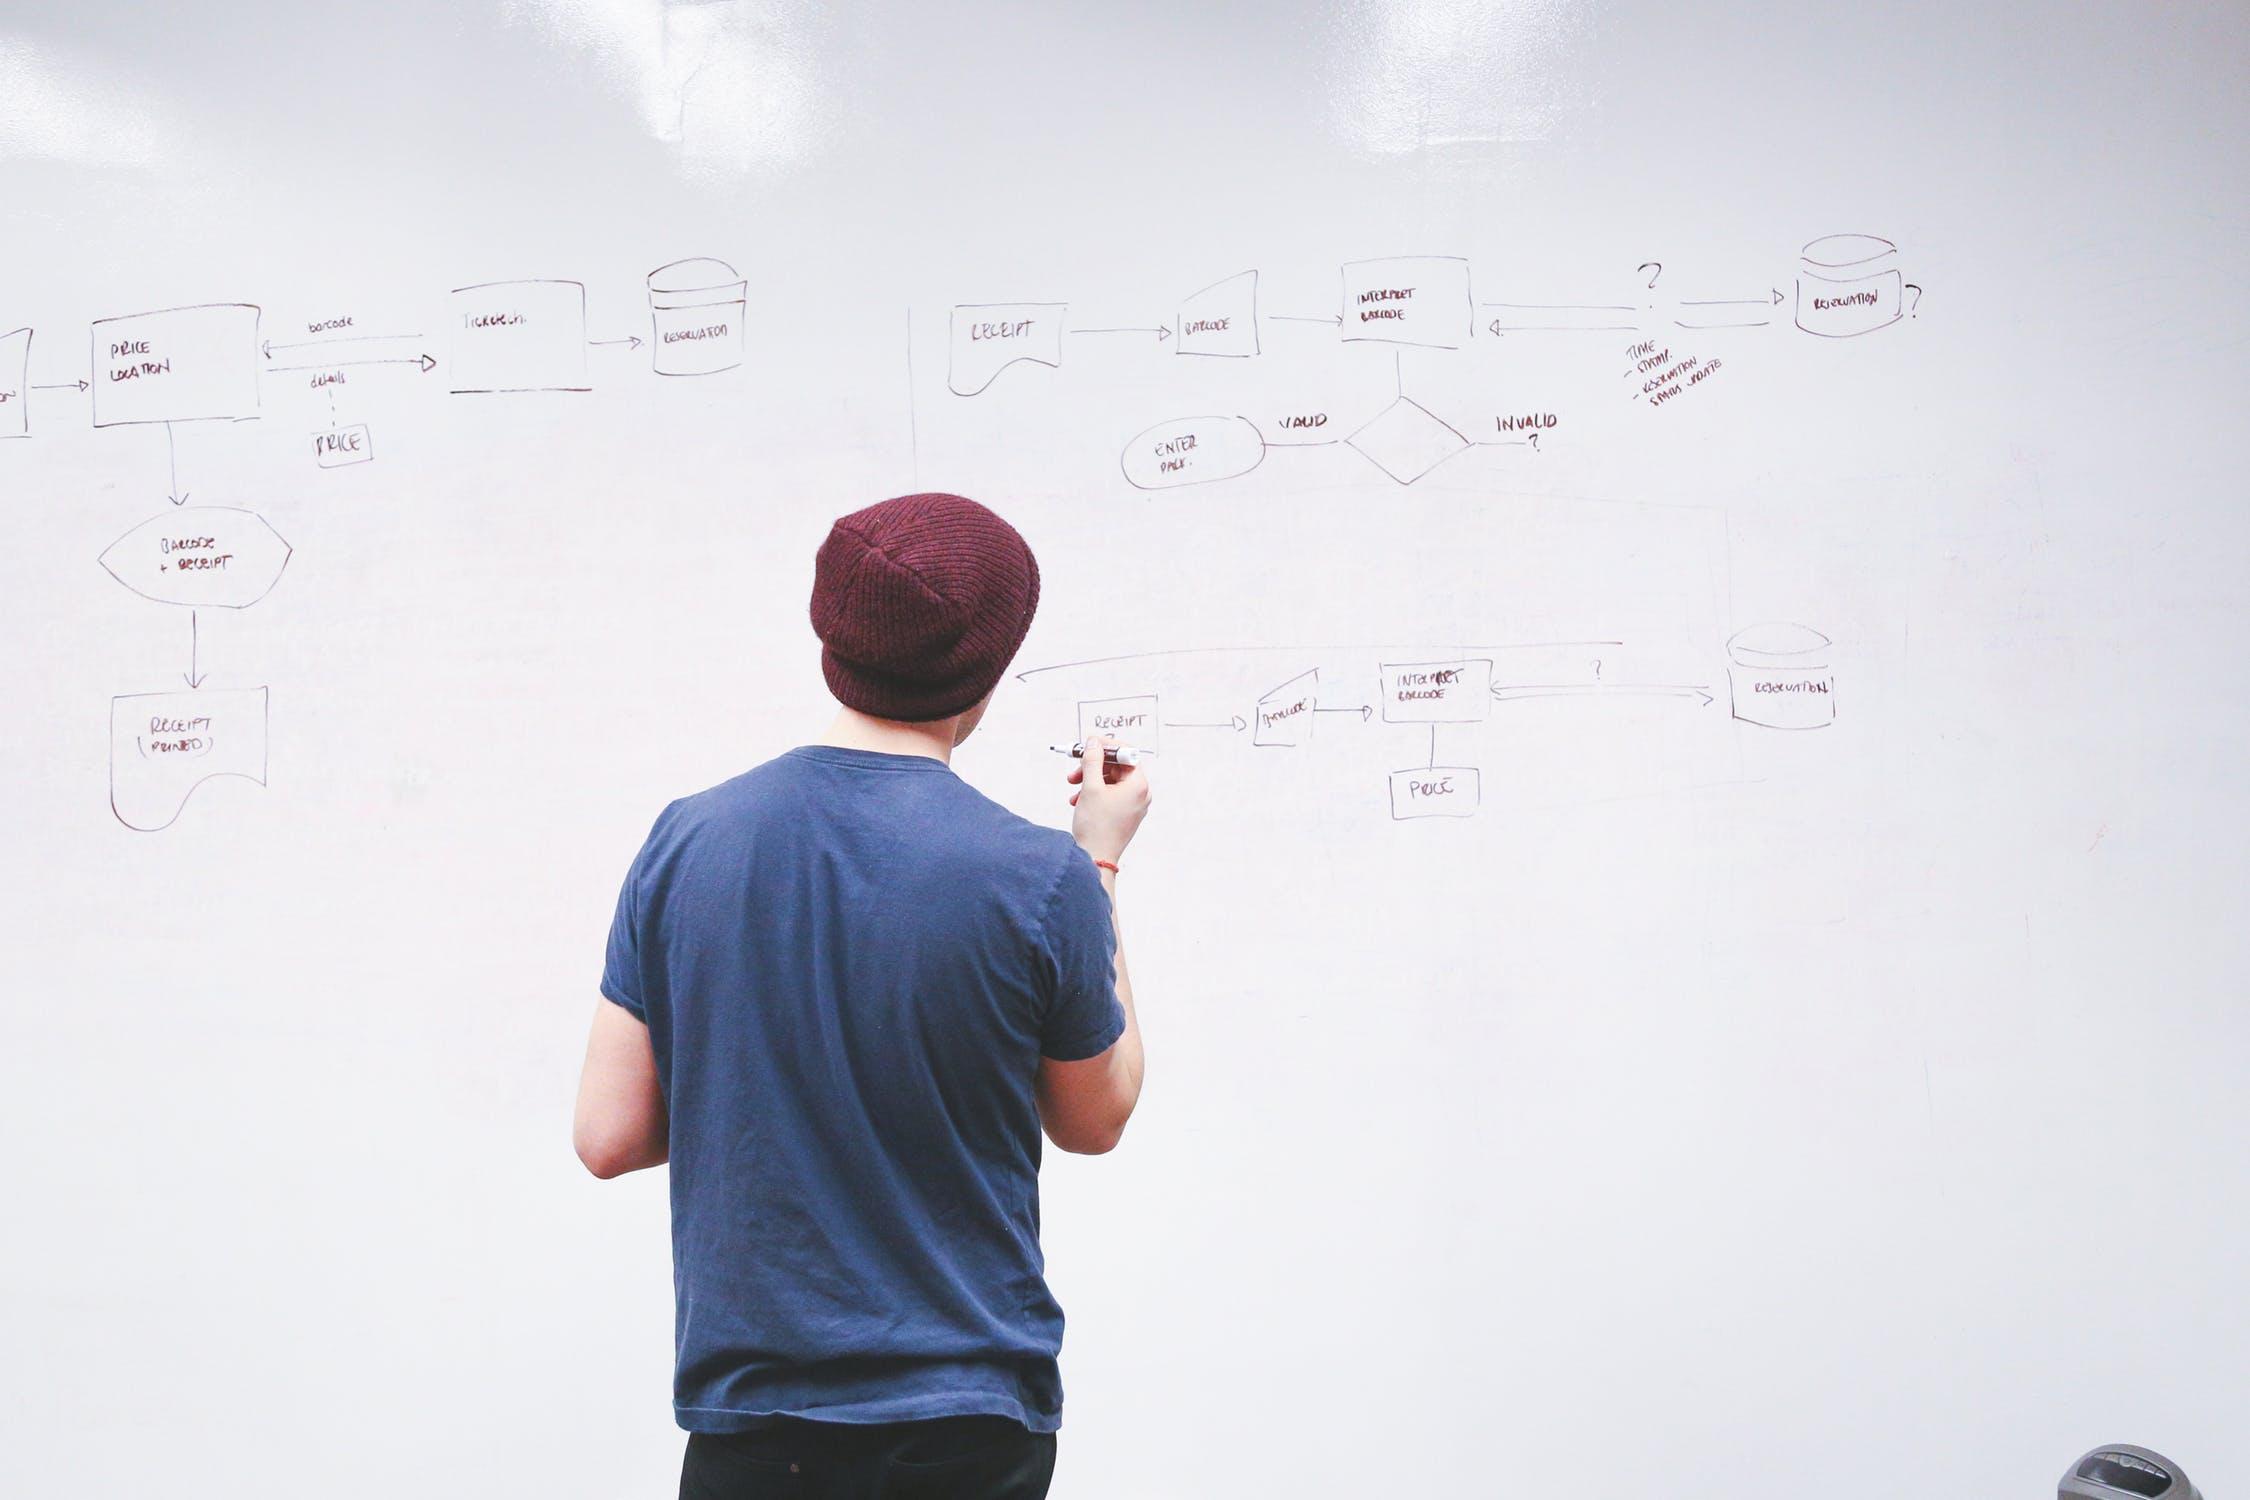 bando Startup innovative 2020